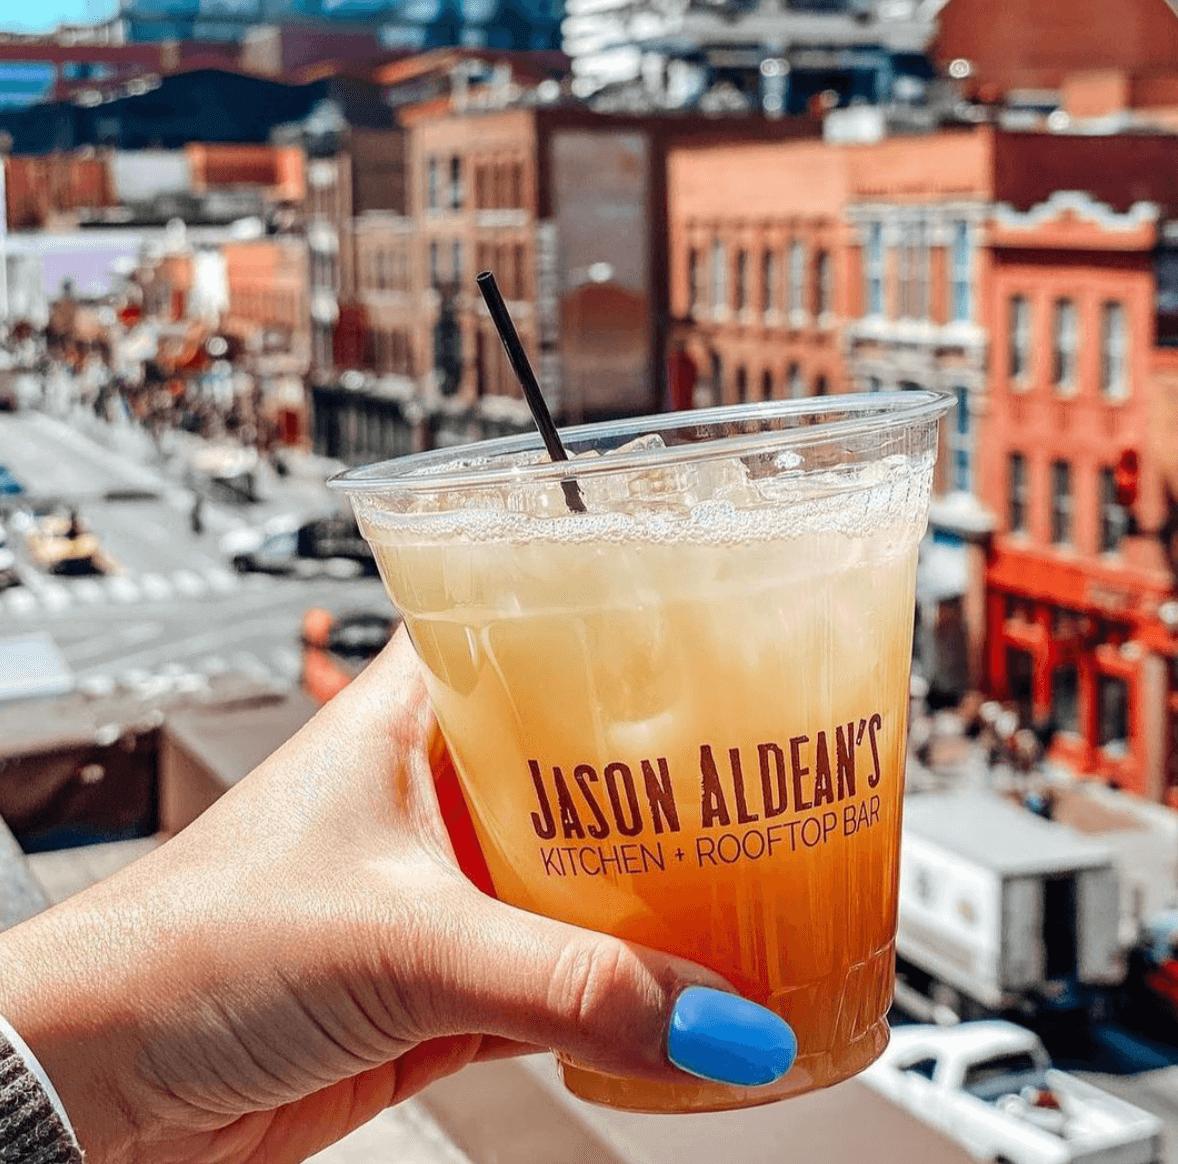 Cocktail from Jason Aldean's Kitchen + Rooftop Bar